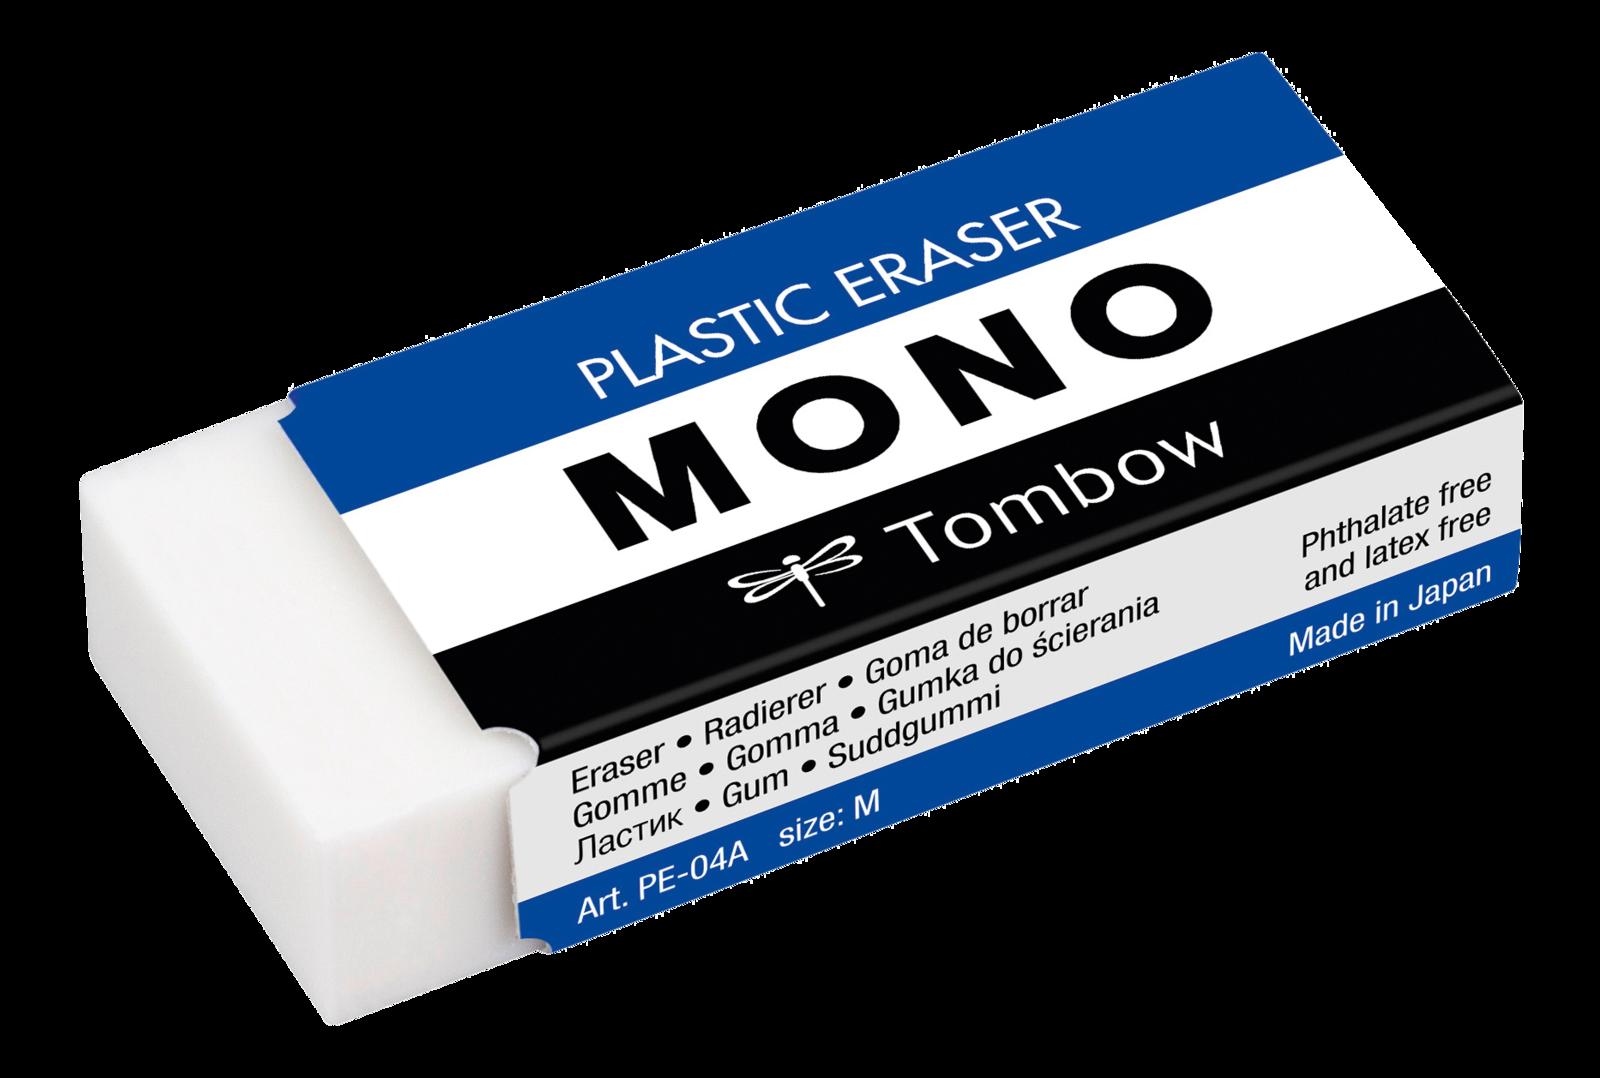 TOMBOW MONO ERASER Made in Japan